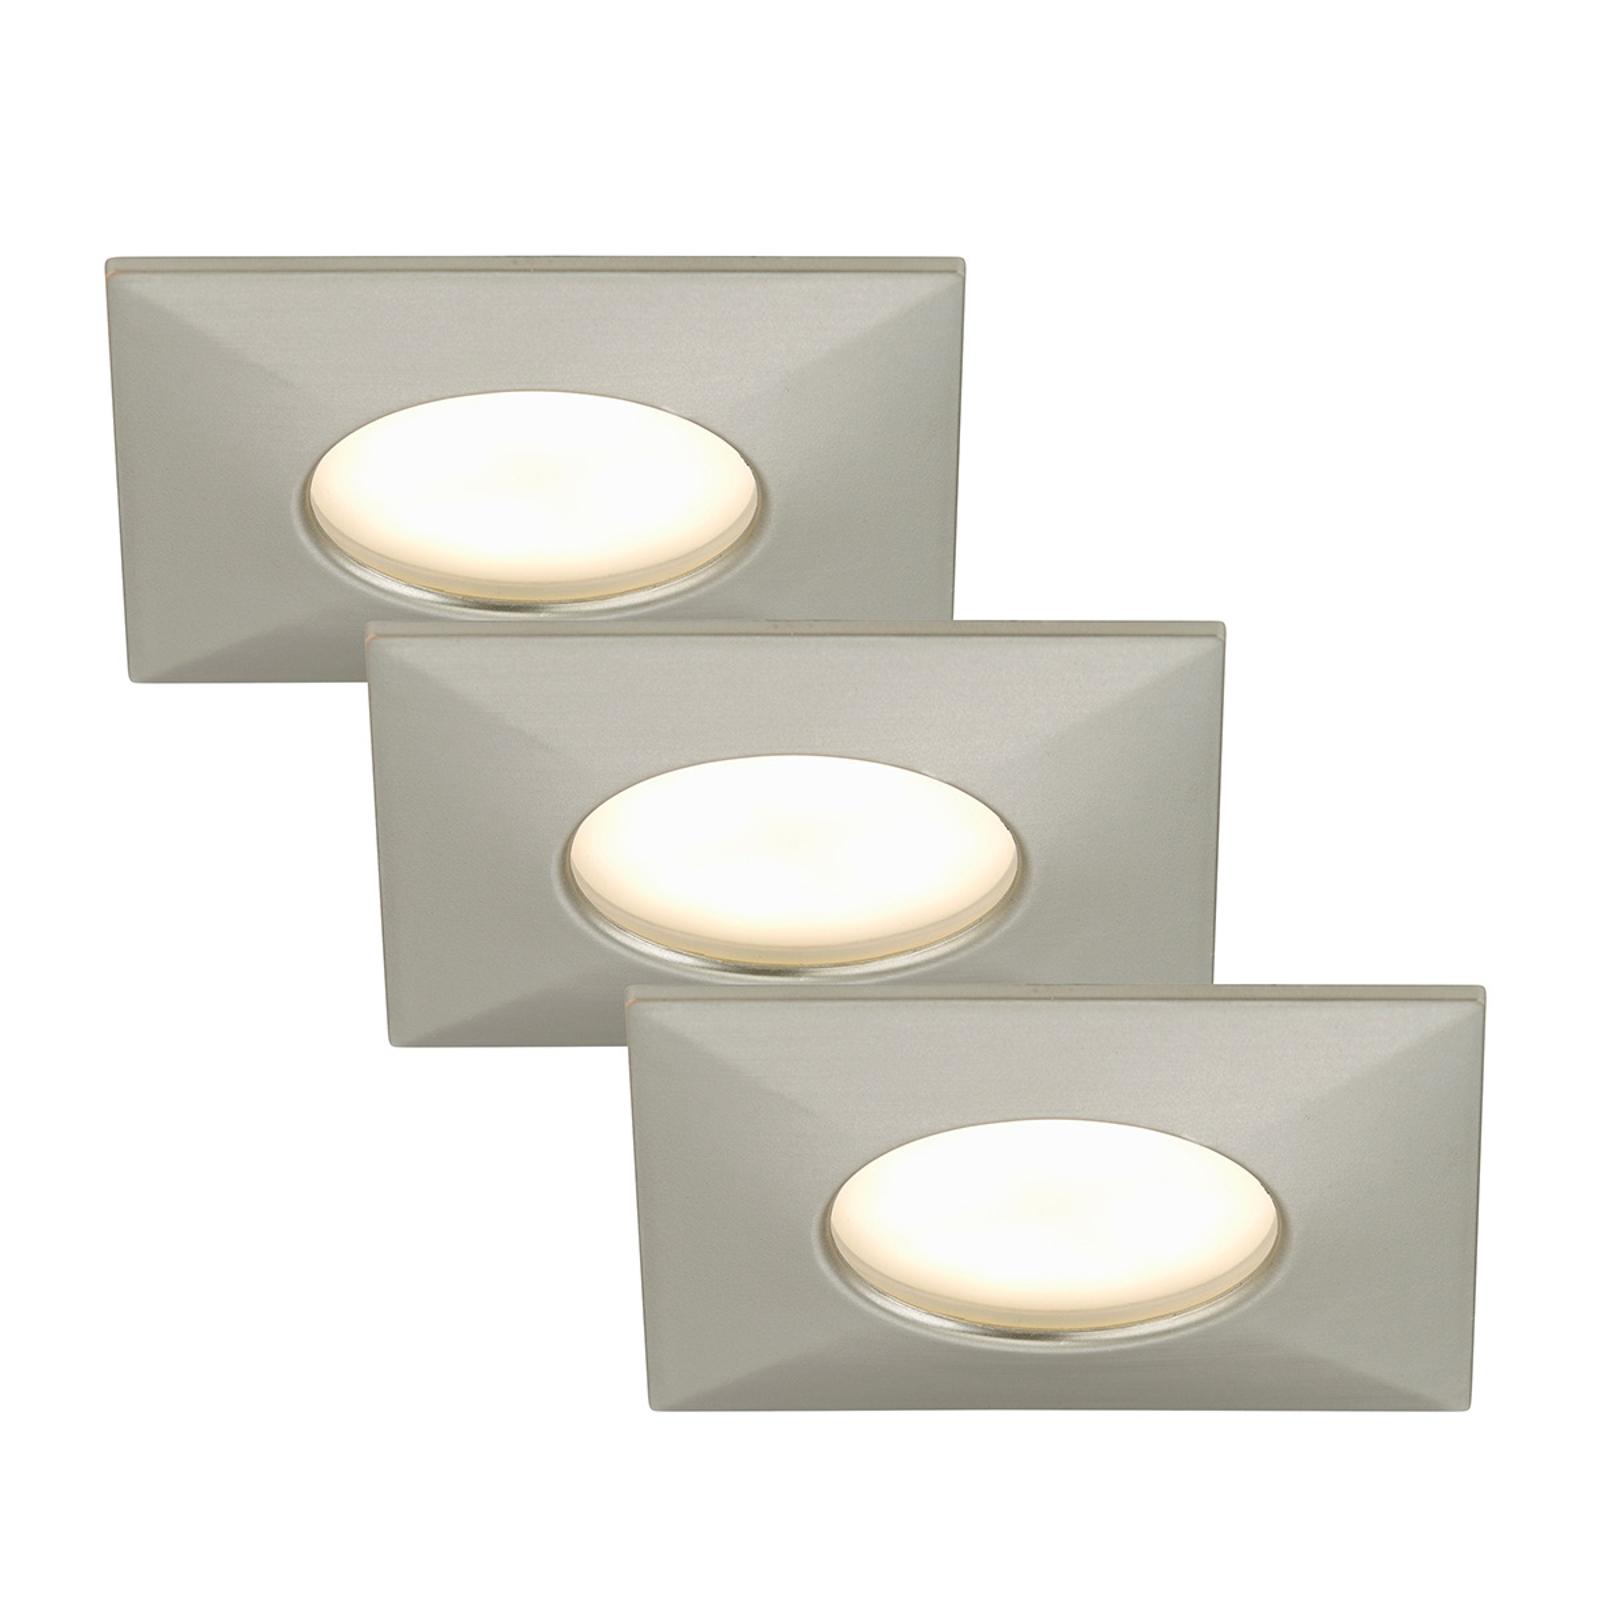 LED recessed light Luca set of three IP44_1510236_1